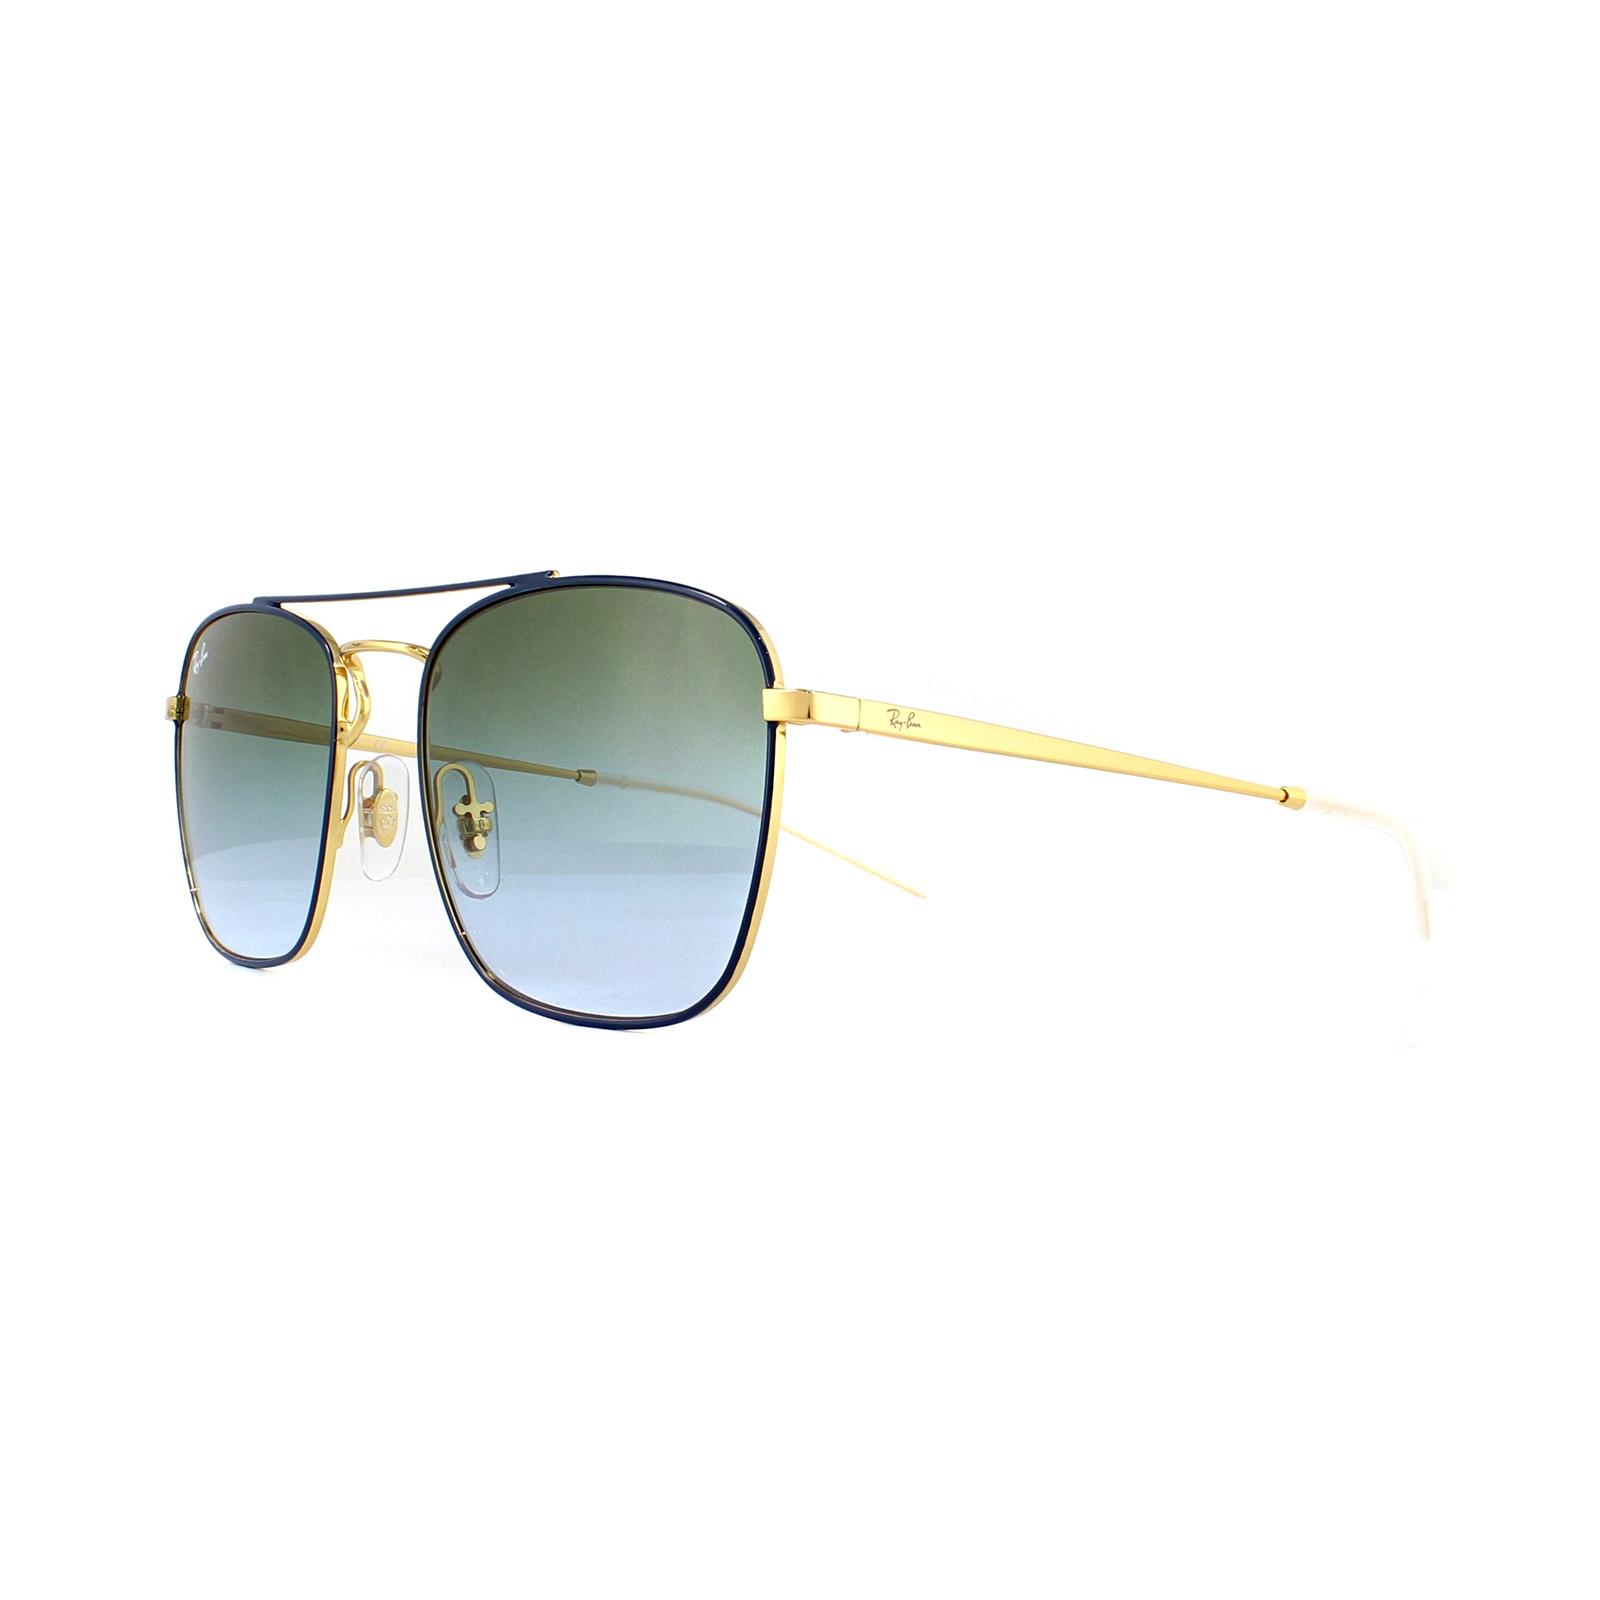 f5ee175f284 Sentinel Ray-Ban Sunglasses 3588 9062I7 Blue Gold Green Gradient